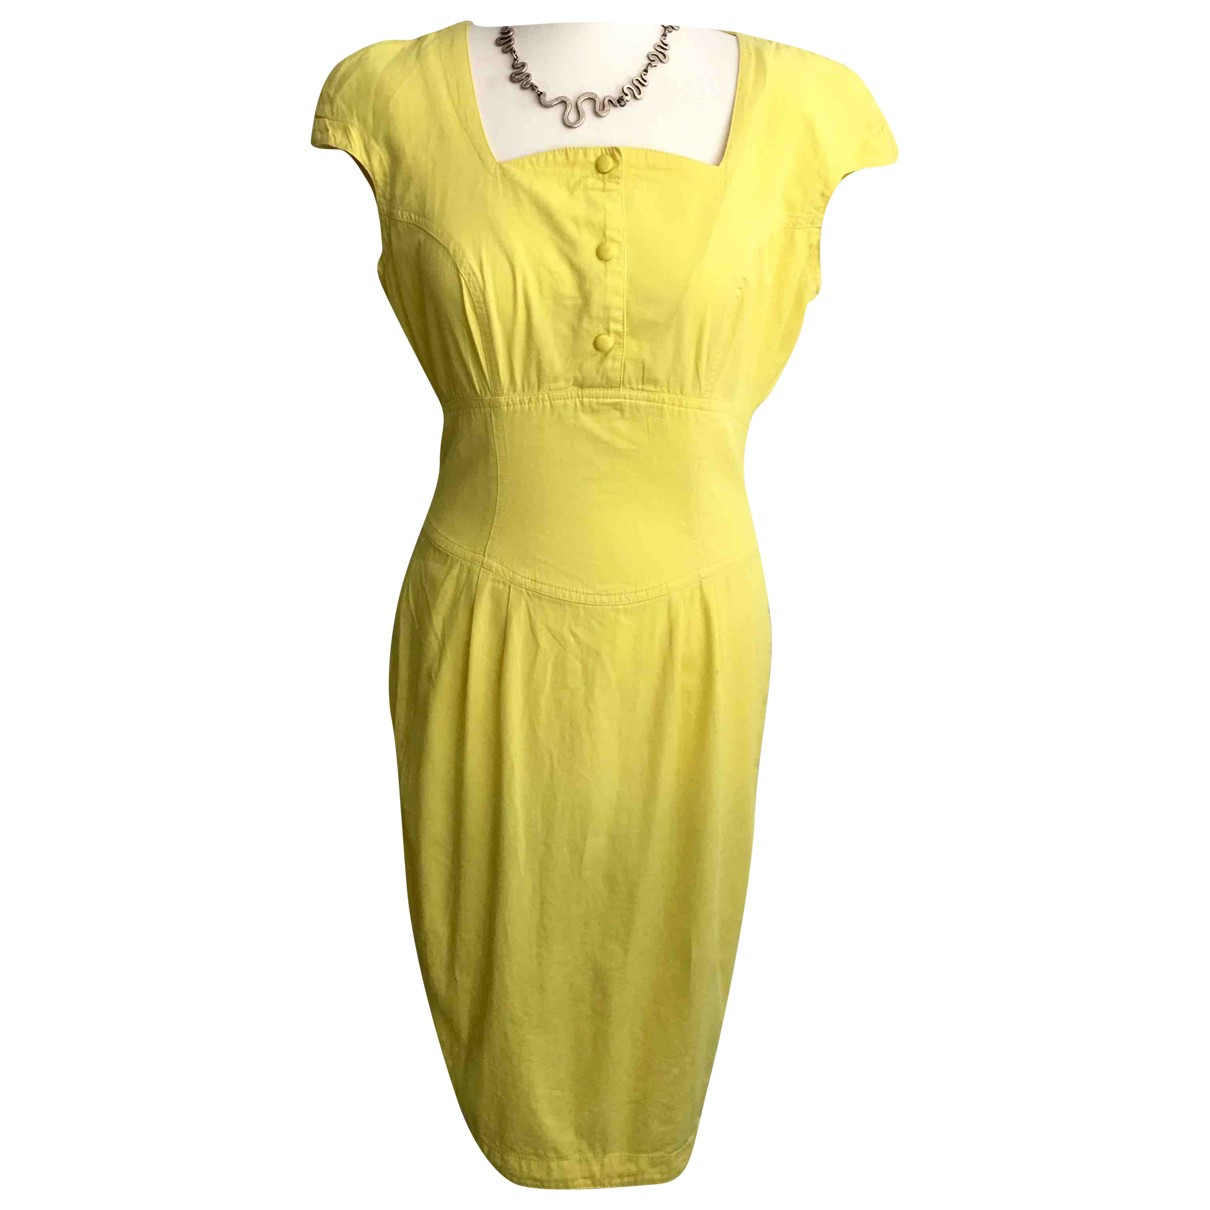 Thierry Mugler \N Yellow Cotton dress for Women 44 IT